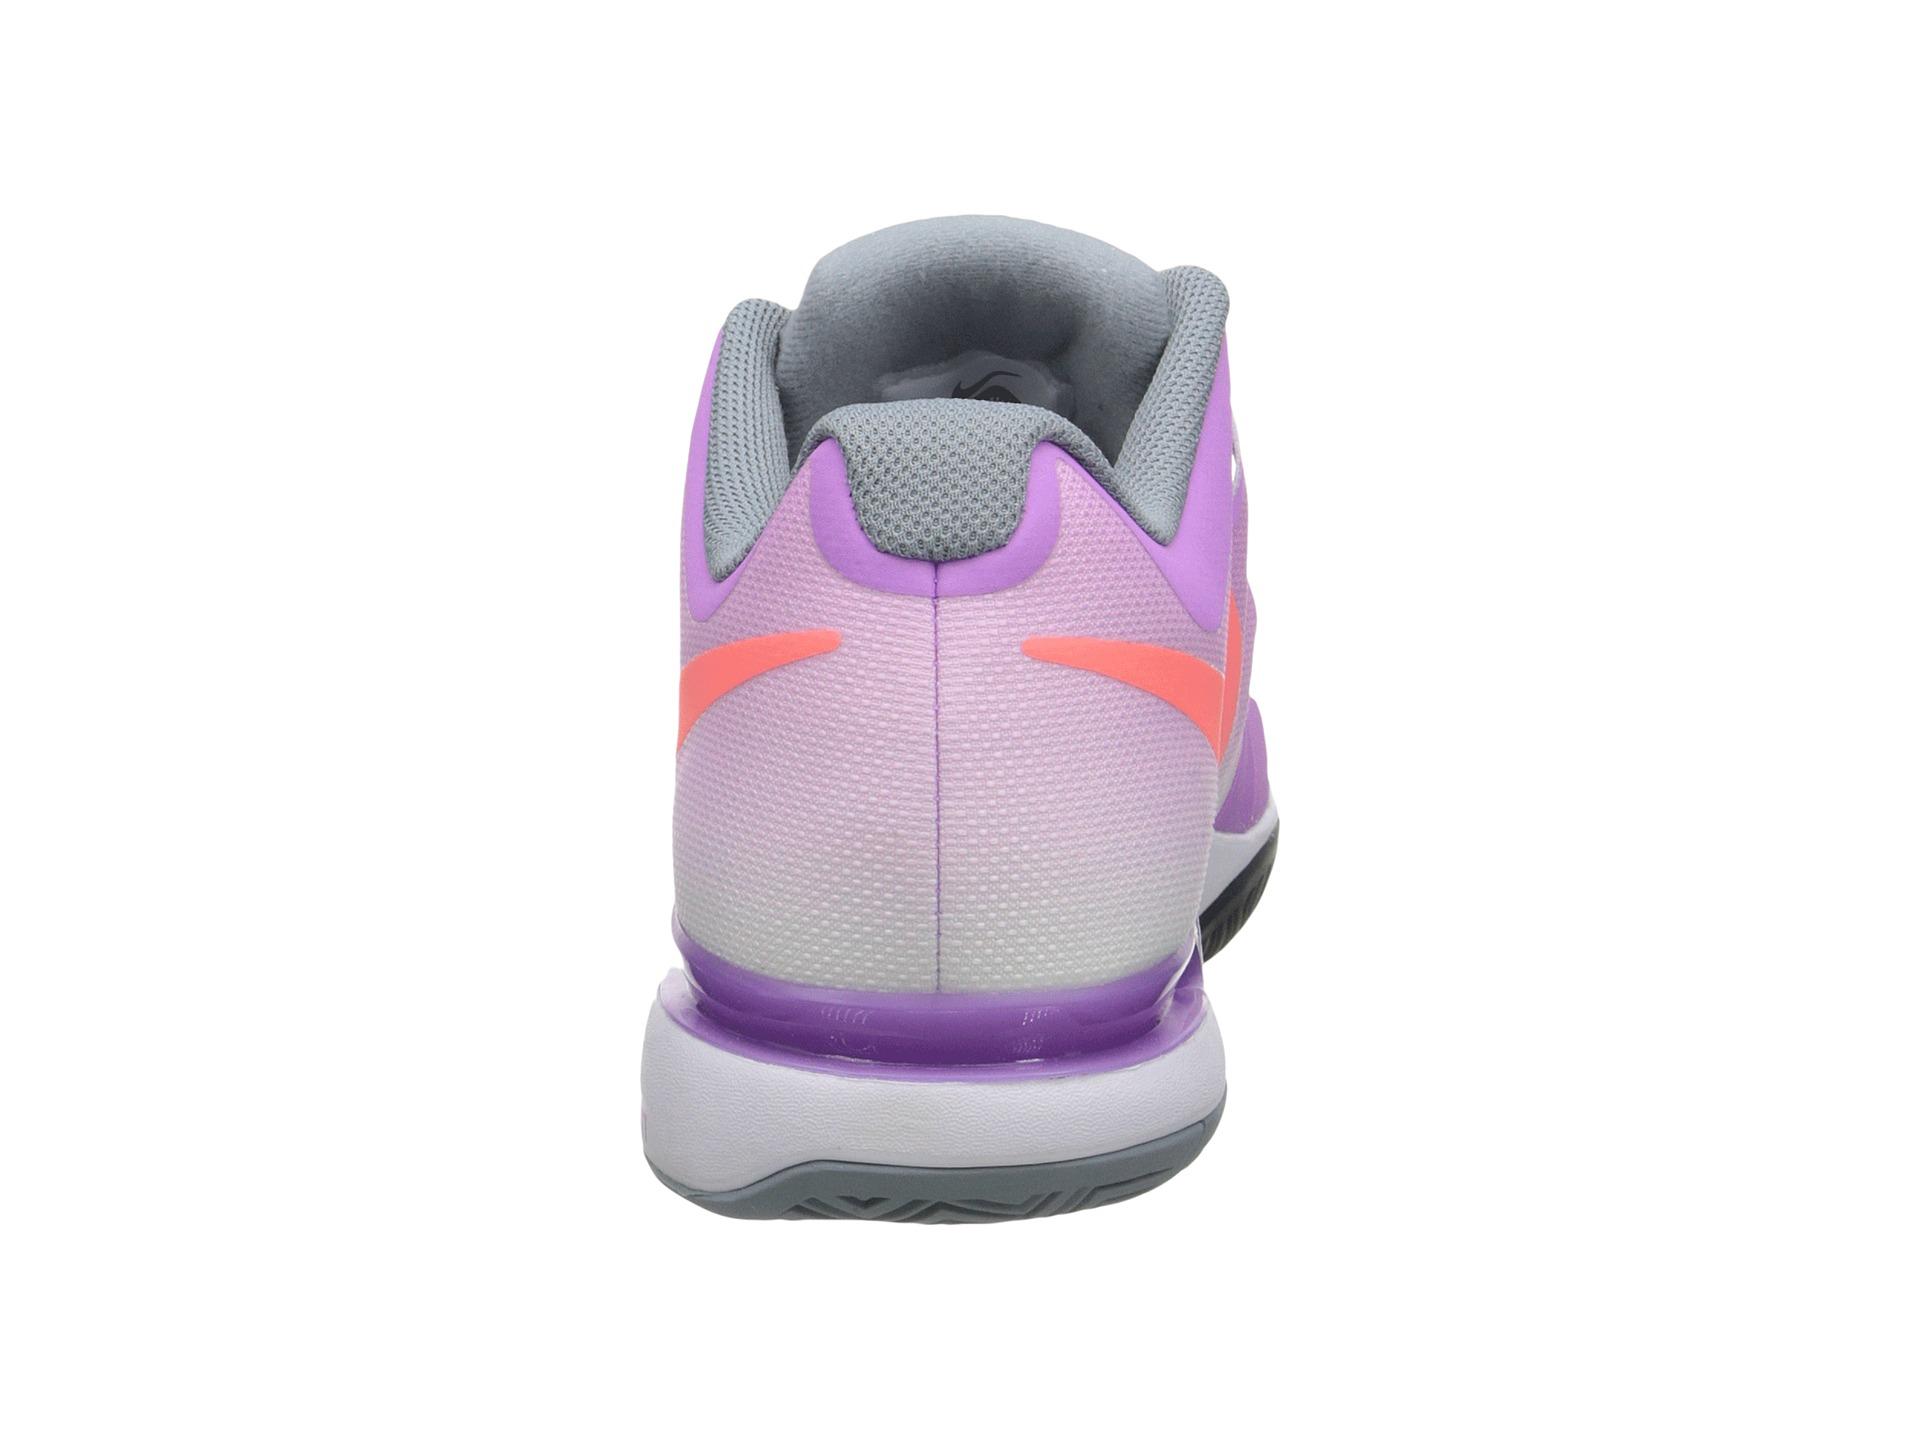 a15f7e1a90dc Lyst - Nike Zoom Vapor 9.5 Tour in Purple